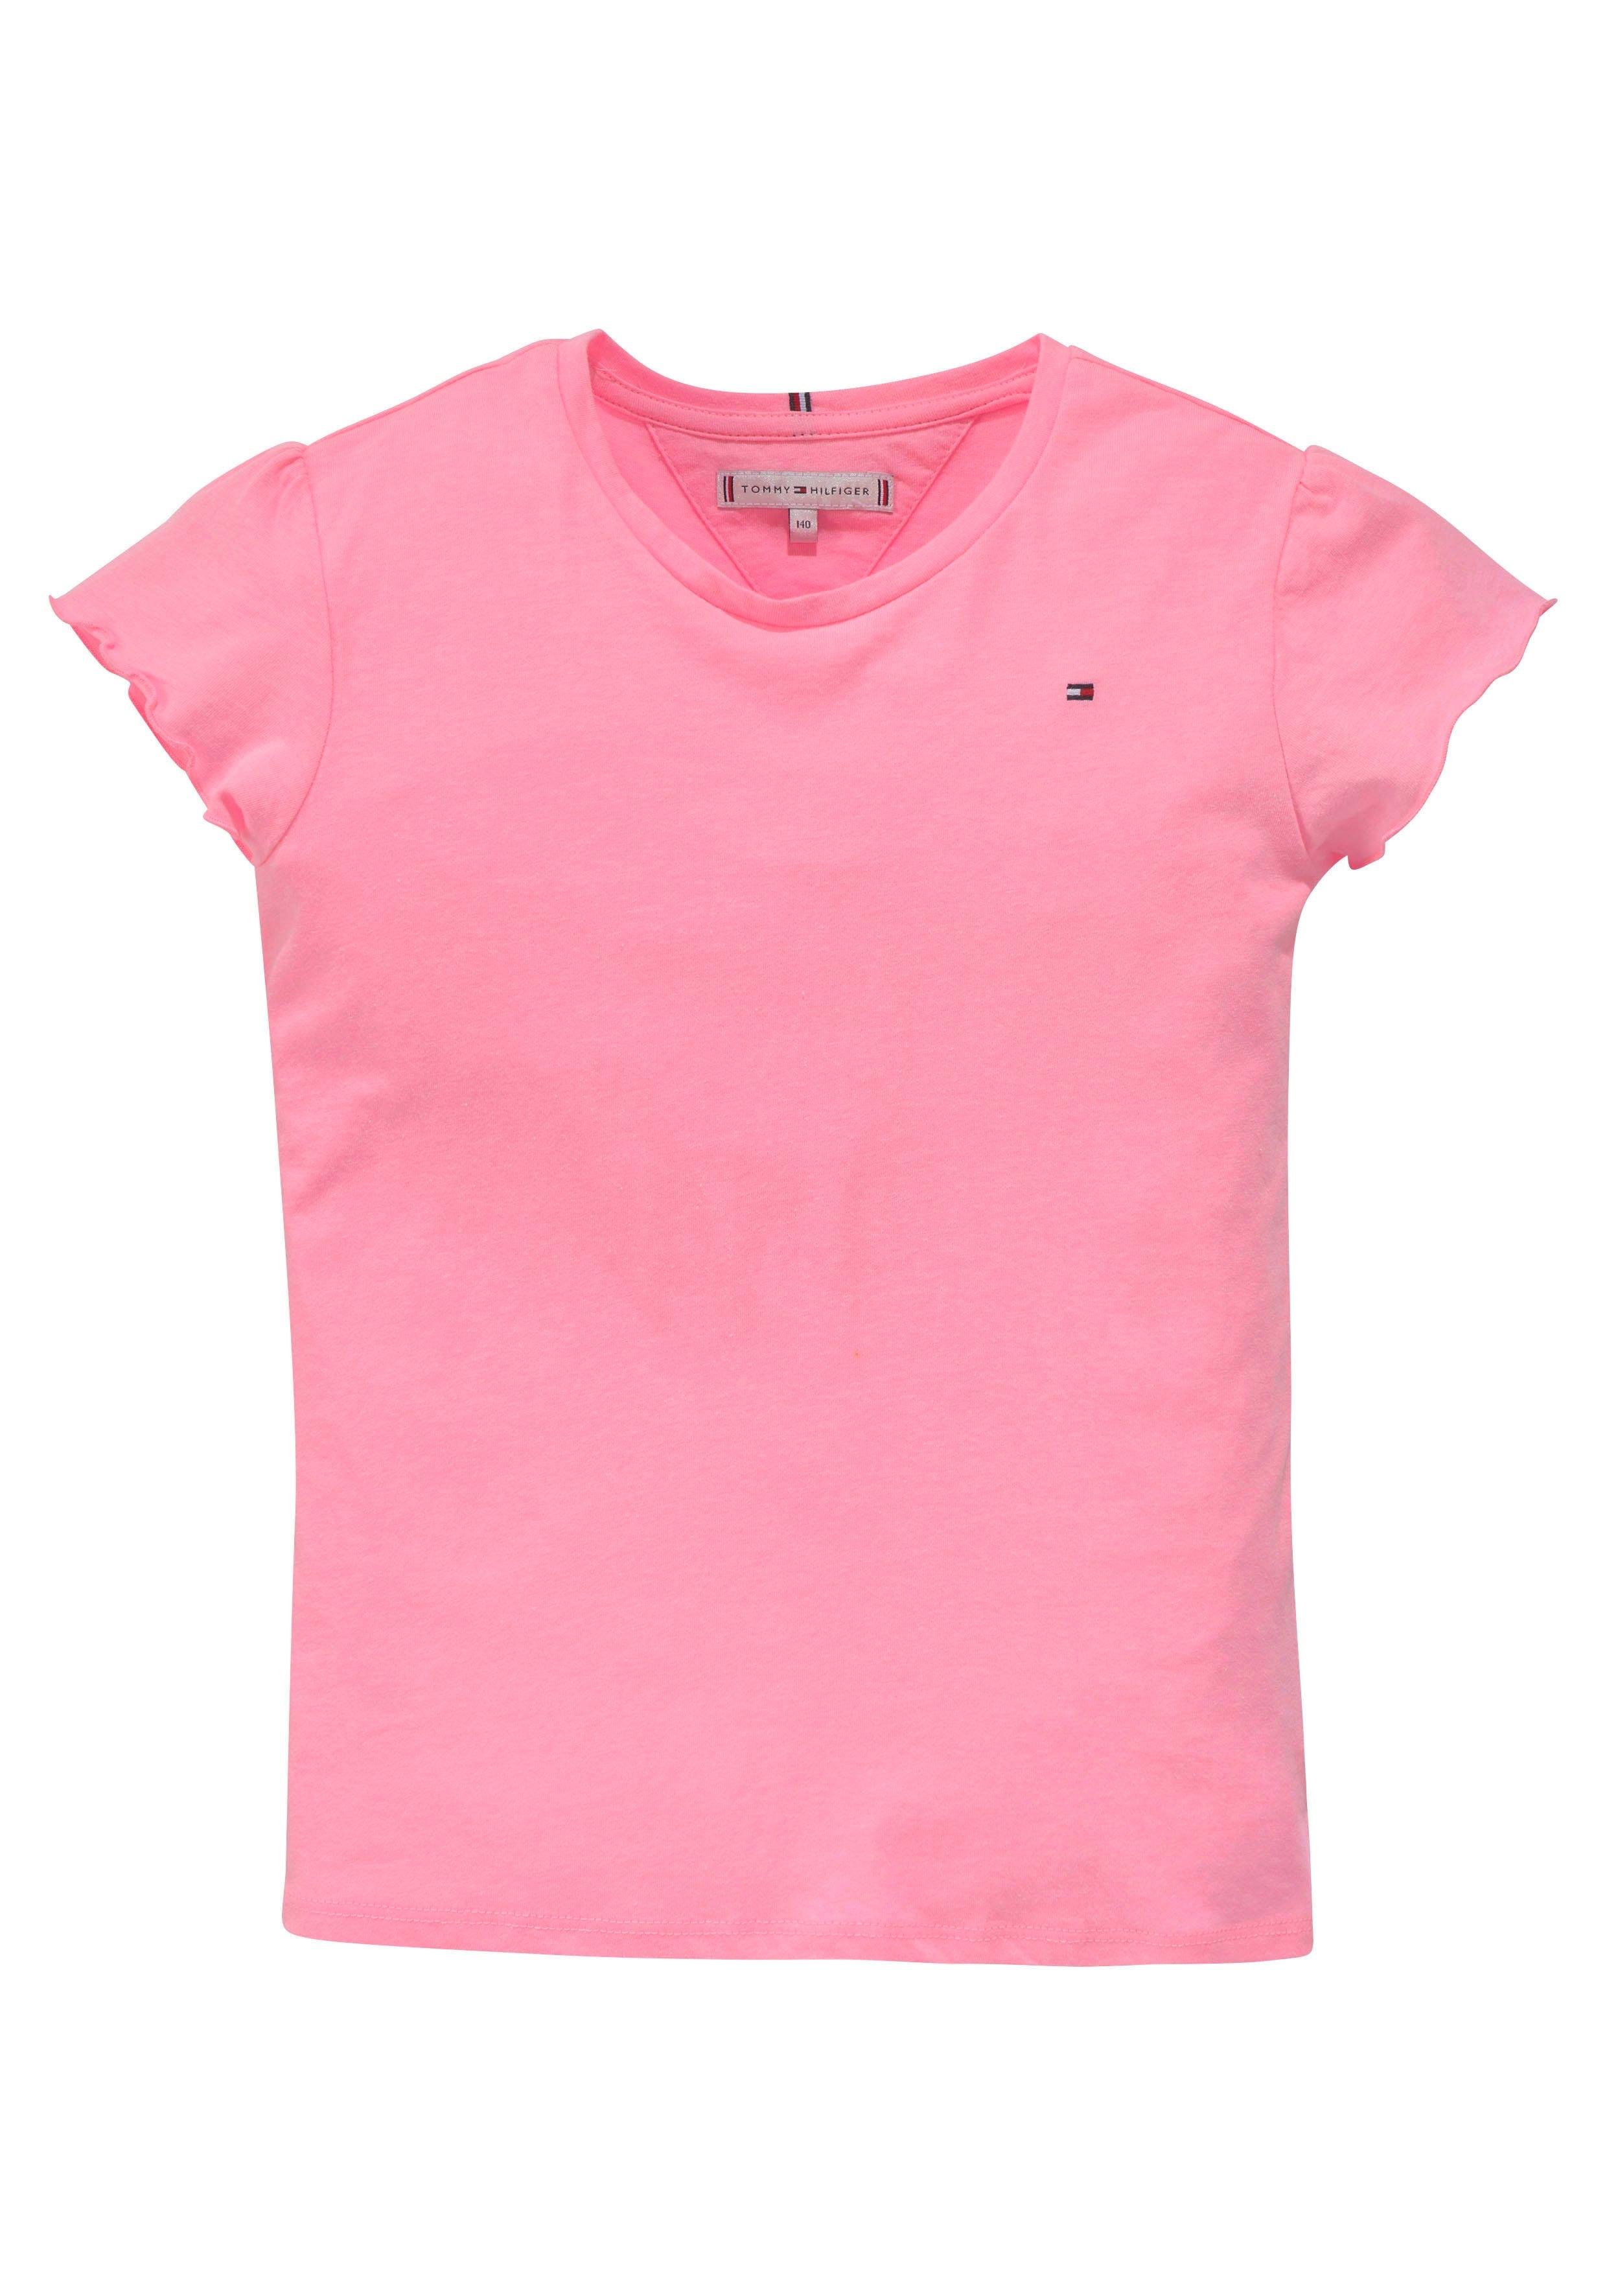 Tommy Hilfiger T-shirt met klein borduursel online kopen op otto.nl